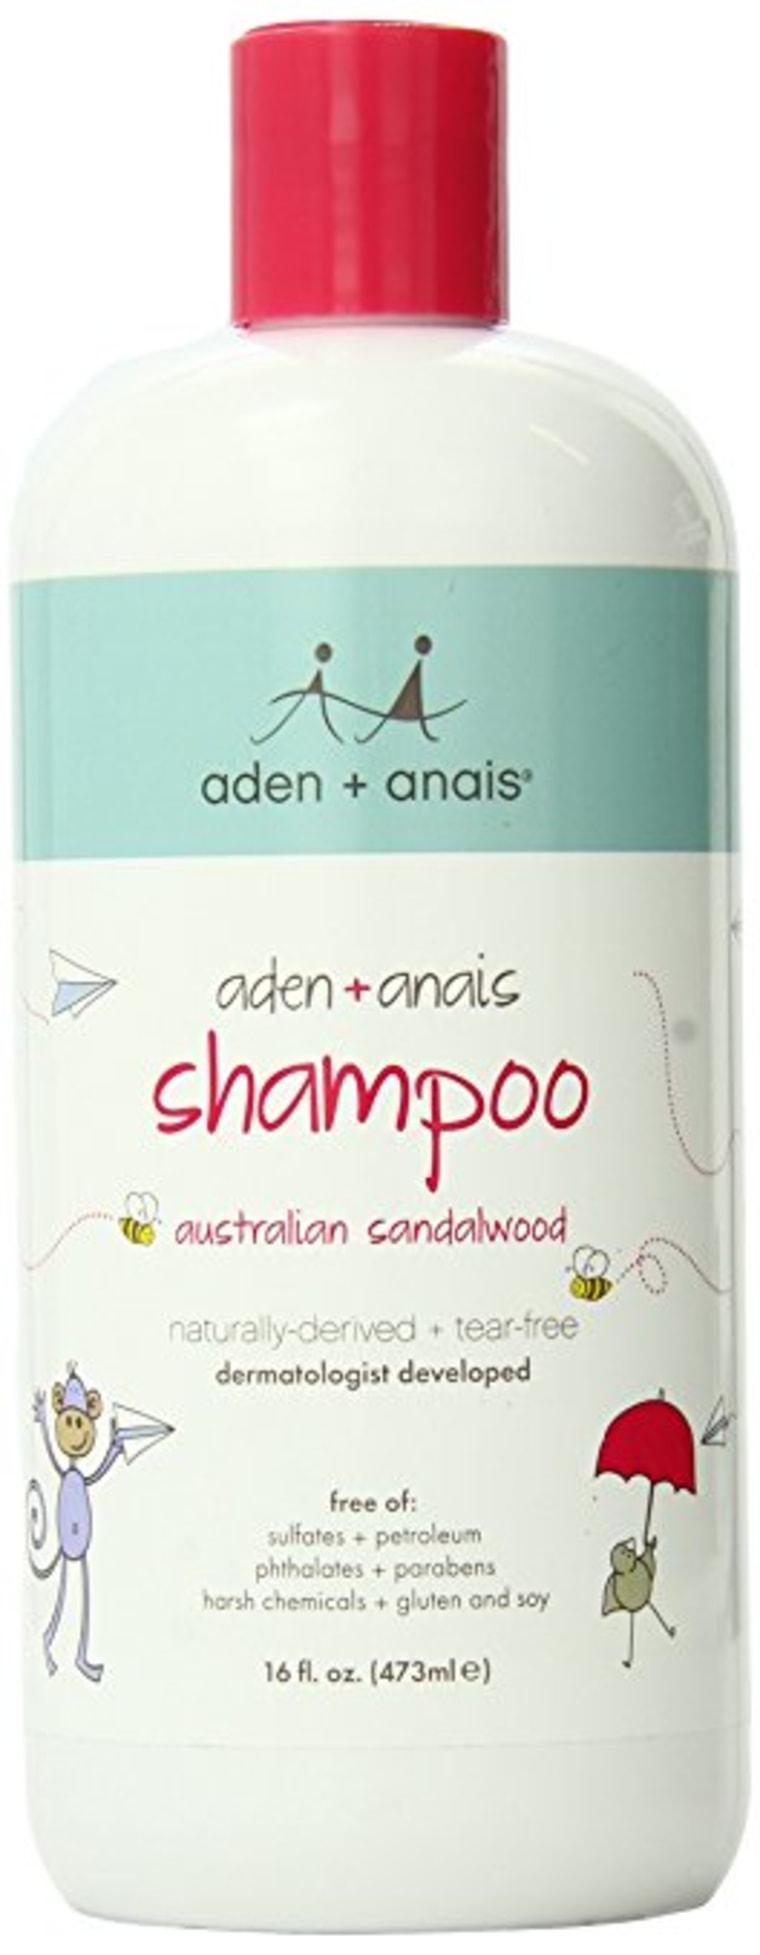 Aden and Anais Shampoo